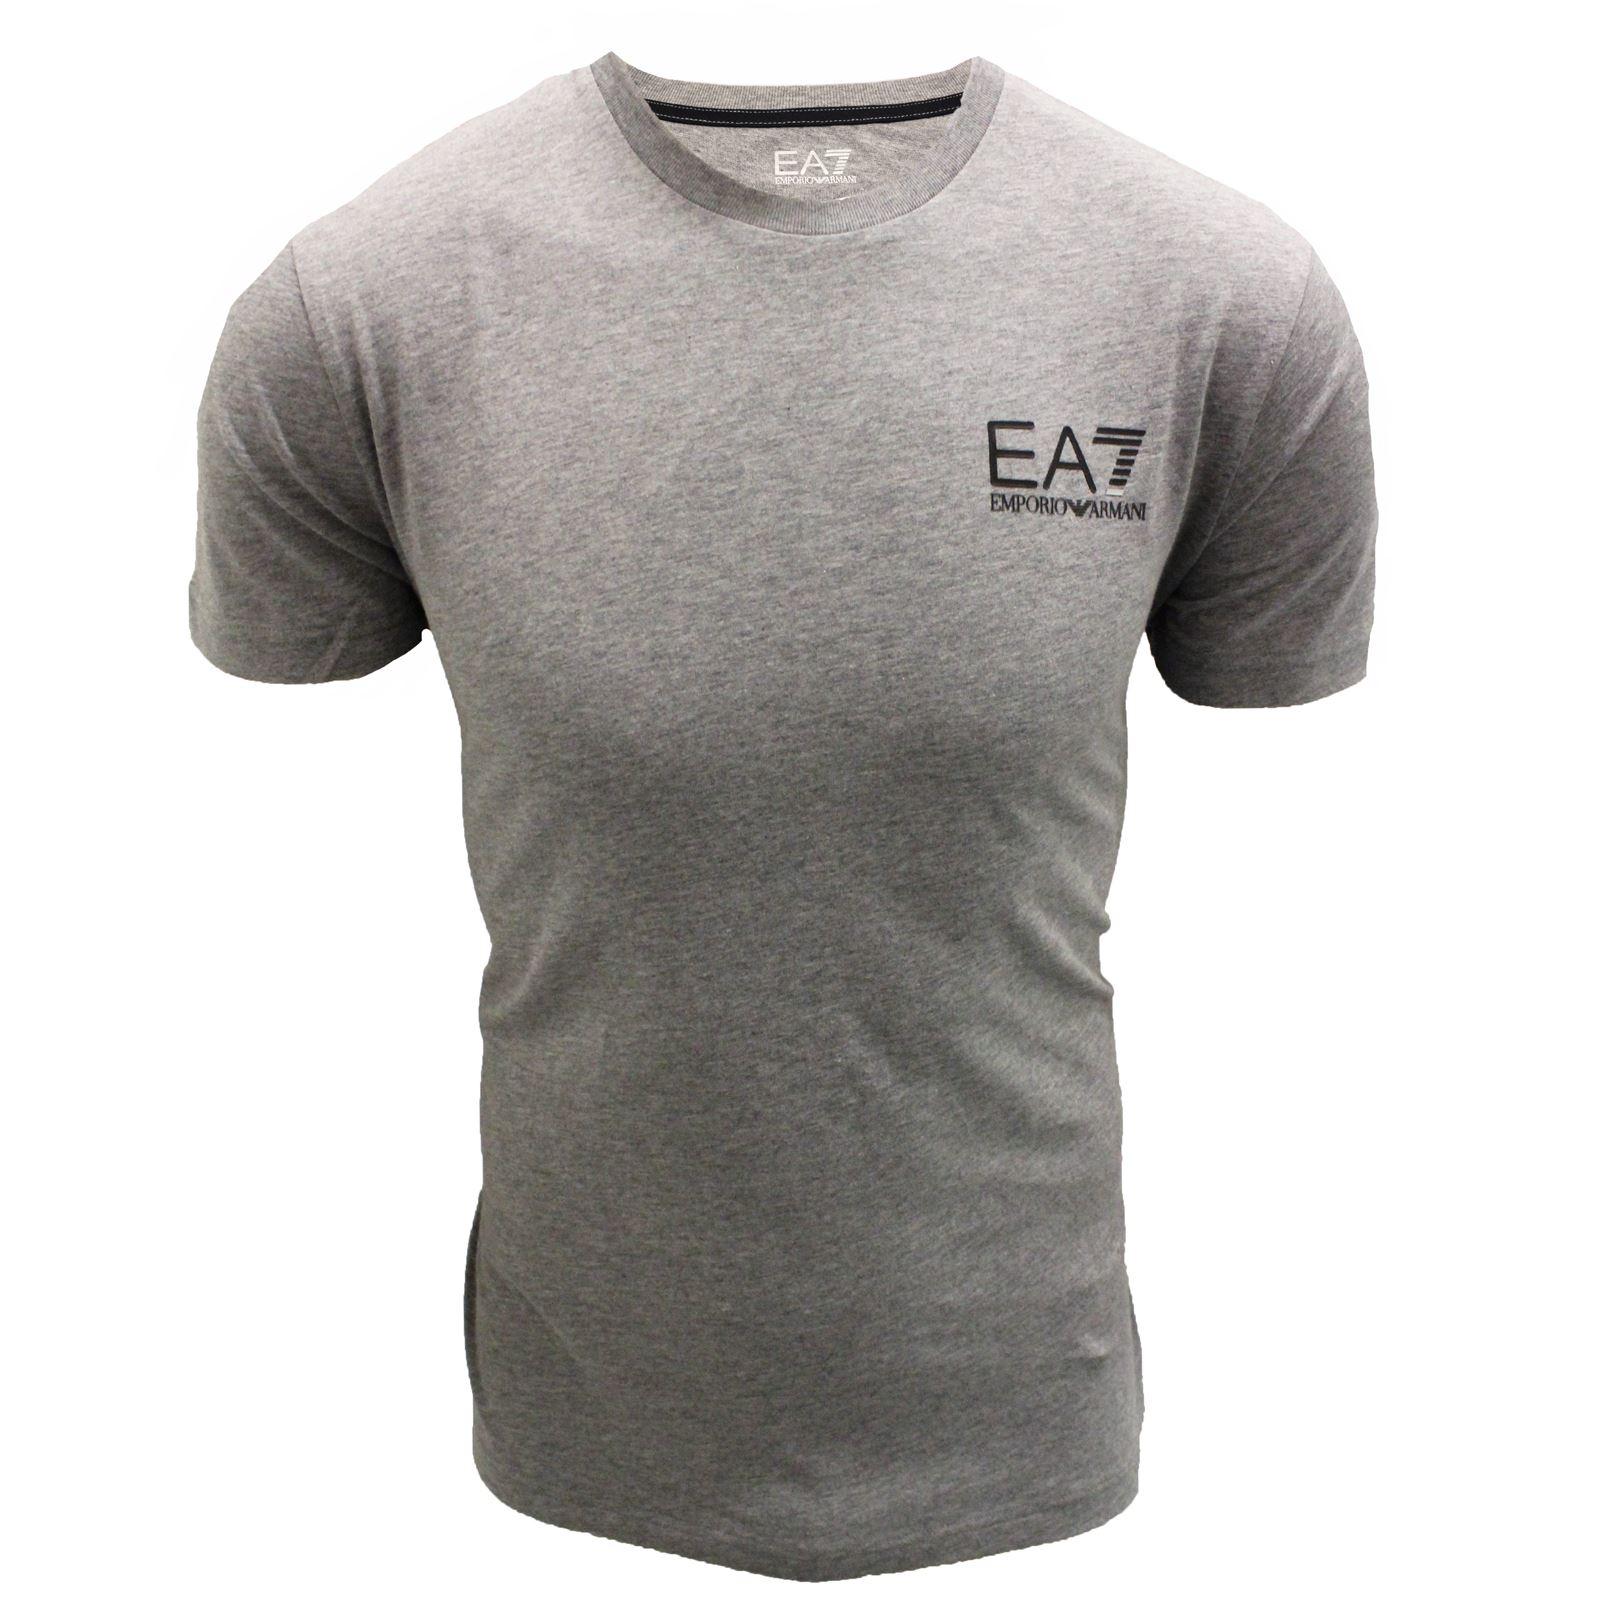 armani t shirt image is loading emporio-armani-t-shirt-ea7-mens-grey-crew- IDDNPYQ